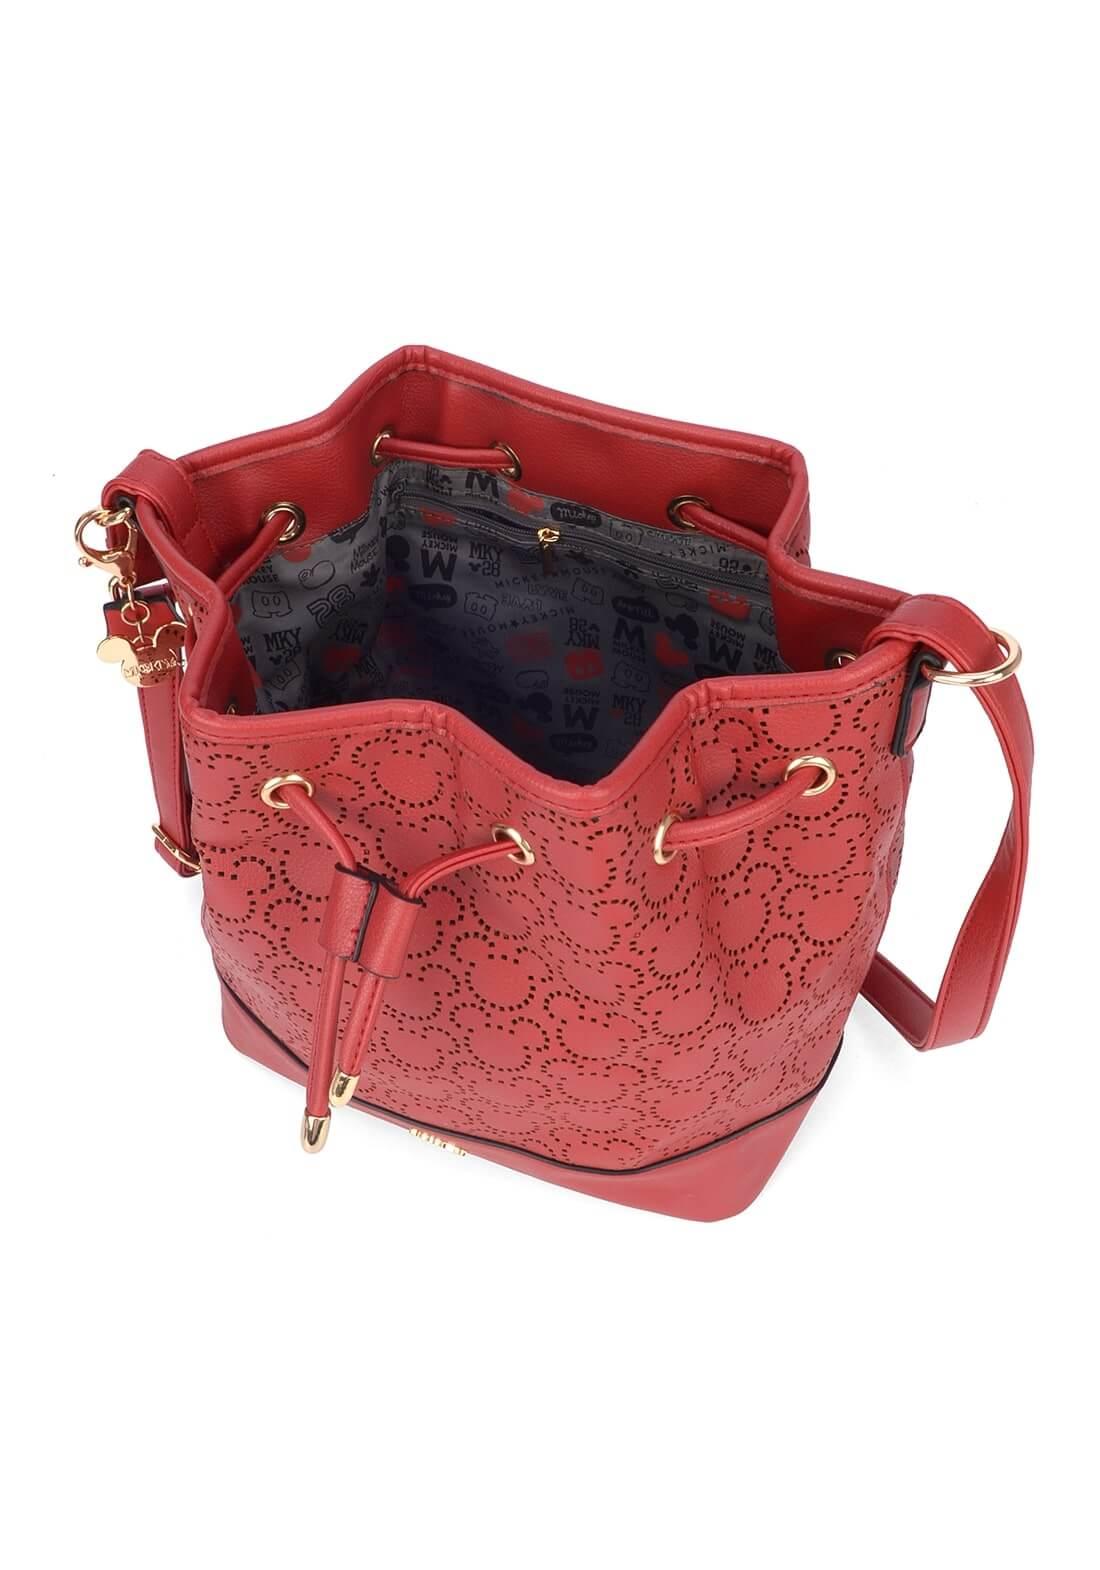 Bolsa Saco Mickey Vermelha Disney Transversal Original